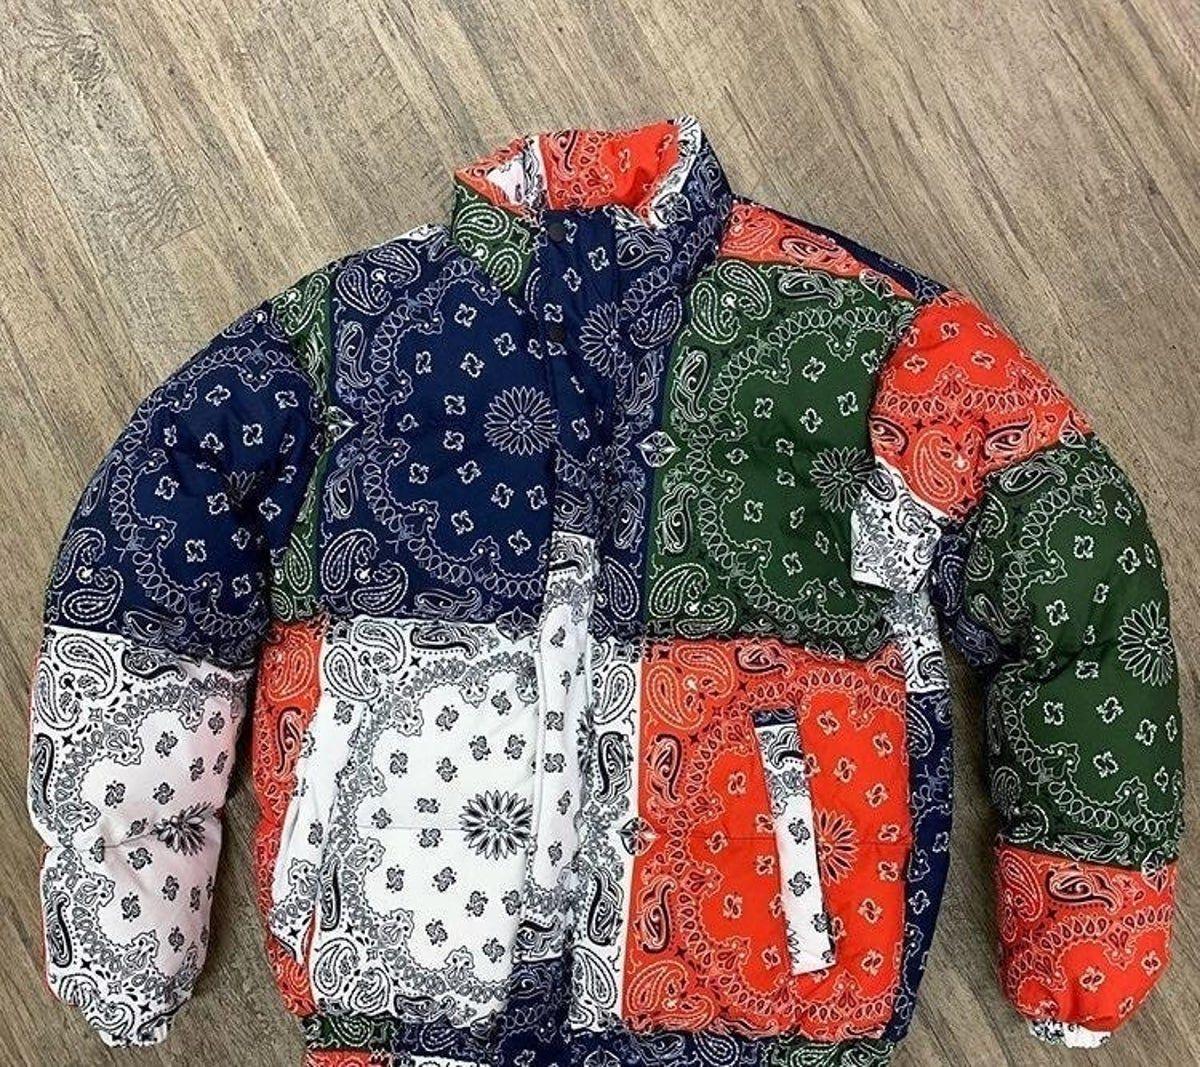 Pin By Anderson Kiarieh On Fashion In 2021 Diy Fashion Clothing Fashion Clothes [ 1067 x 1200 Pixel ]